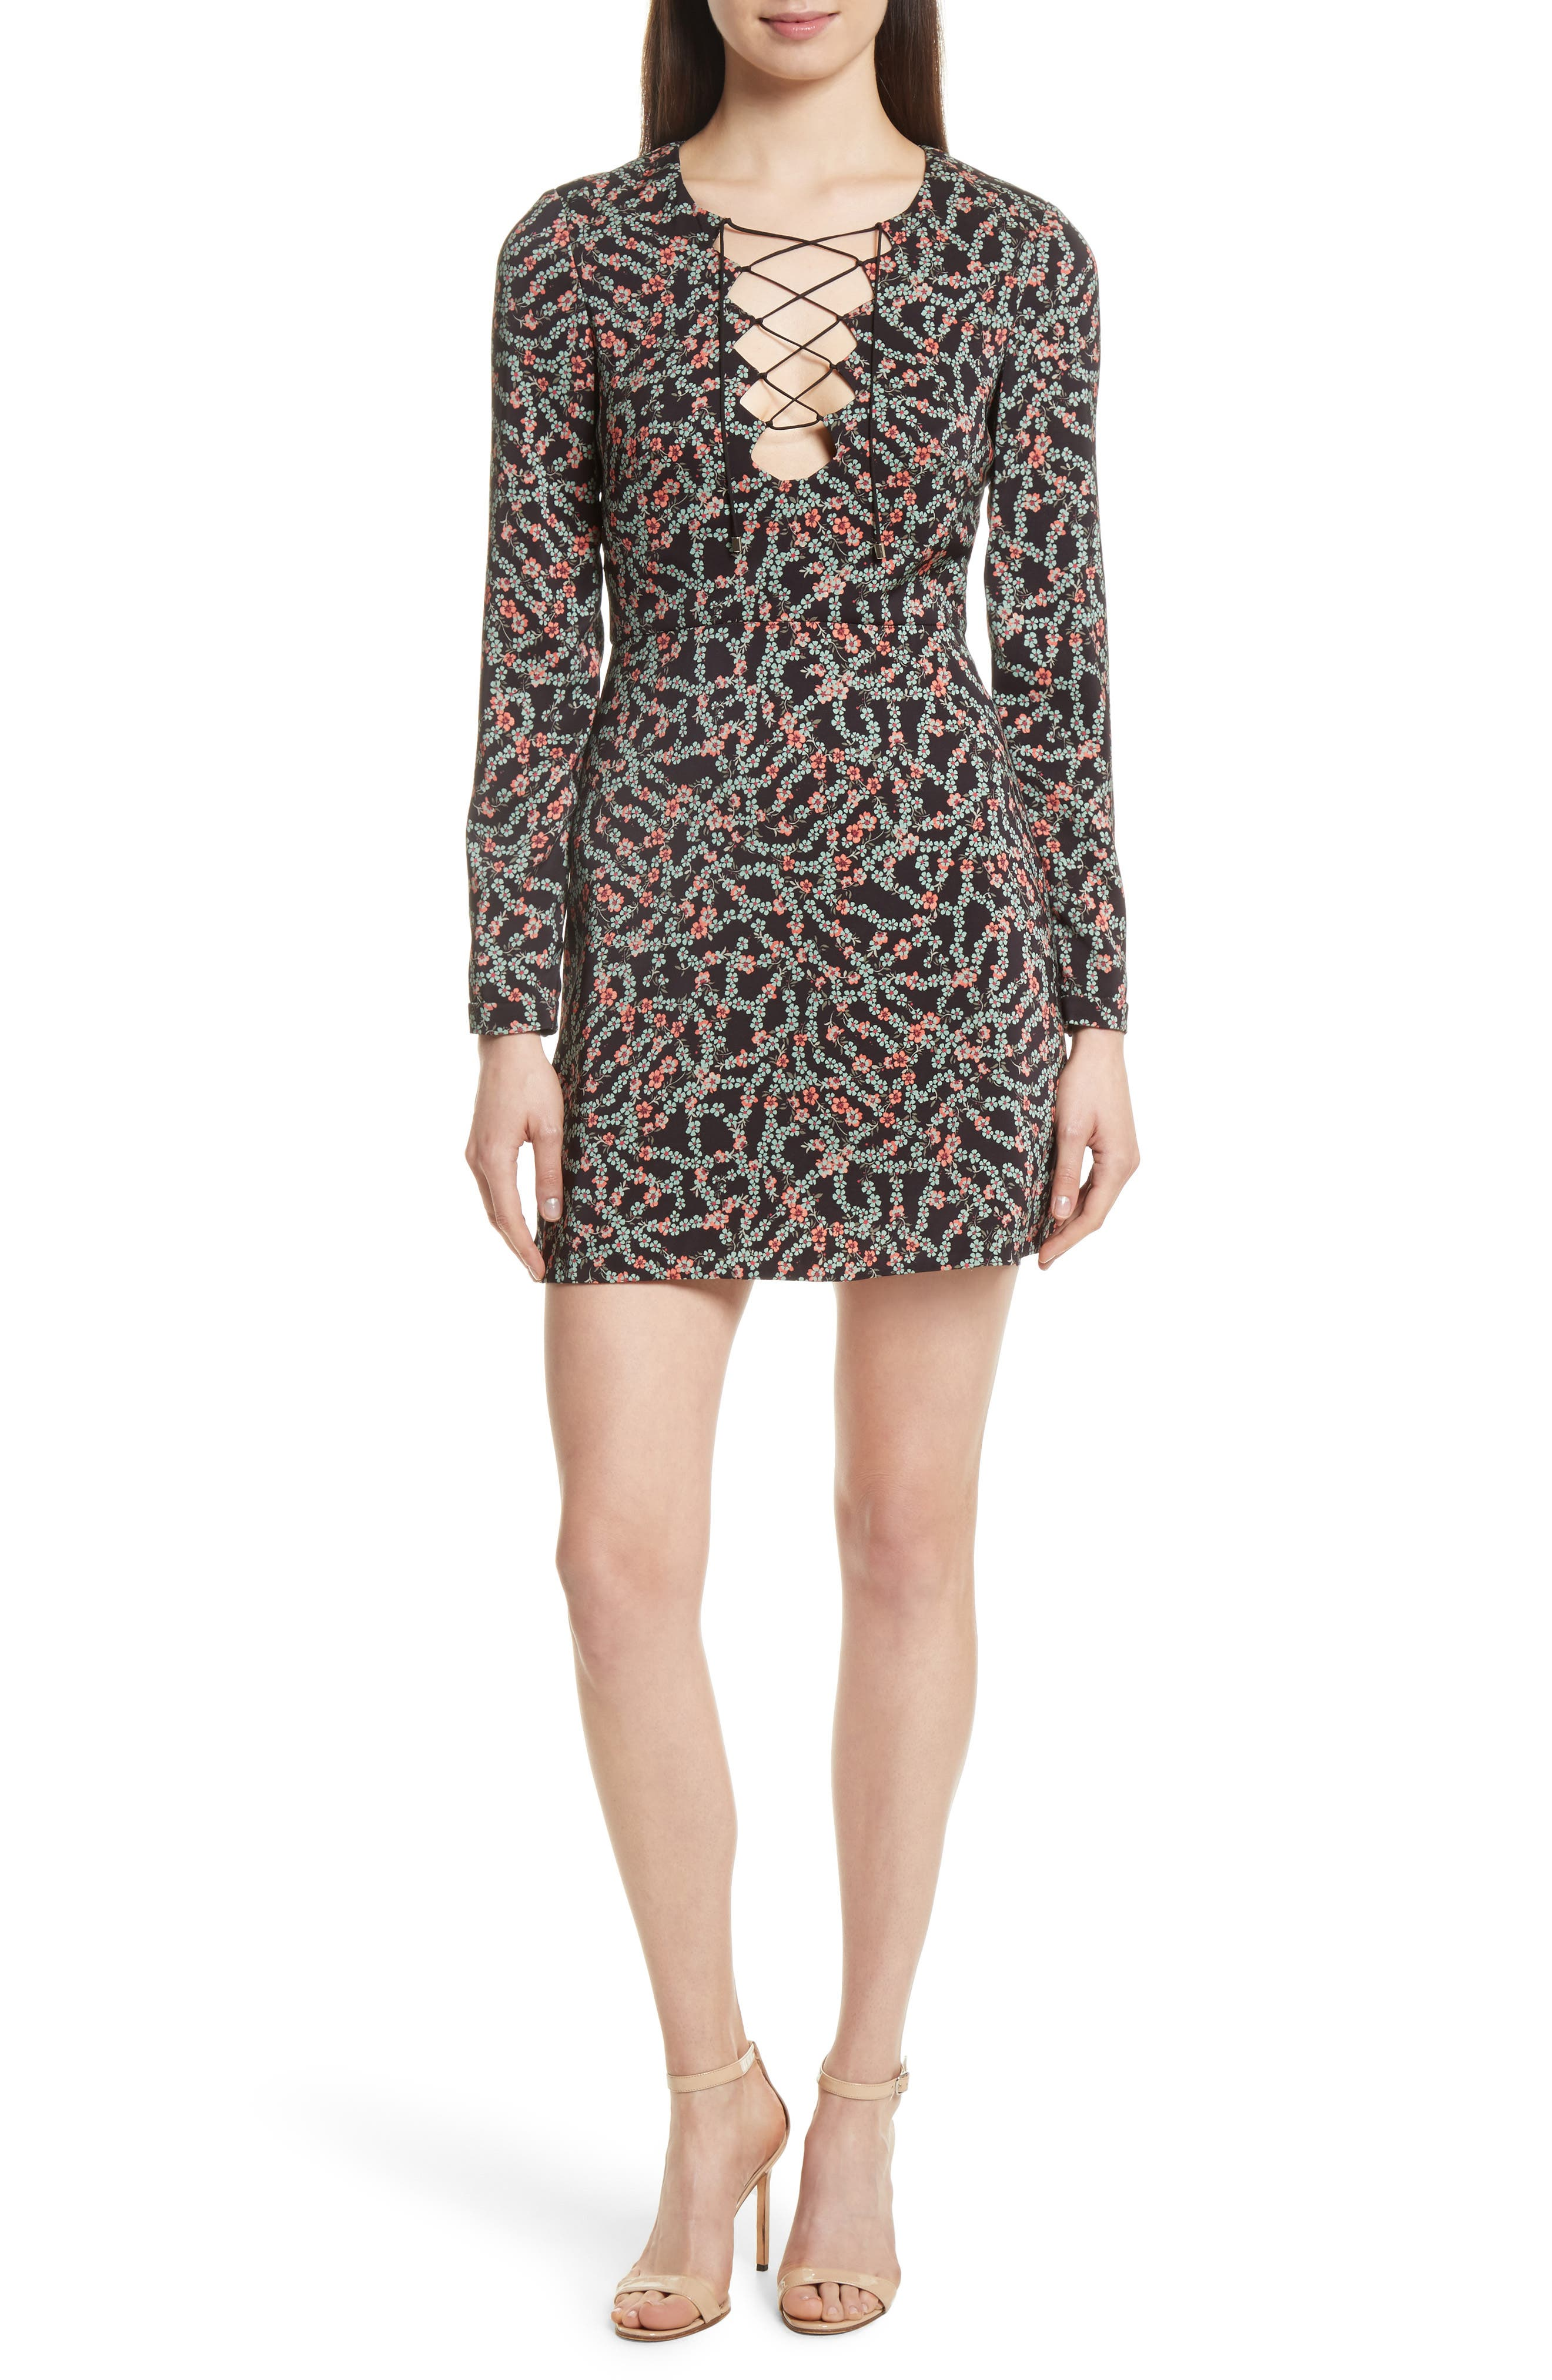 SALONI Nurul Floral Print Lace-Up Dress